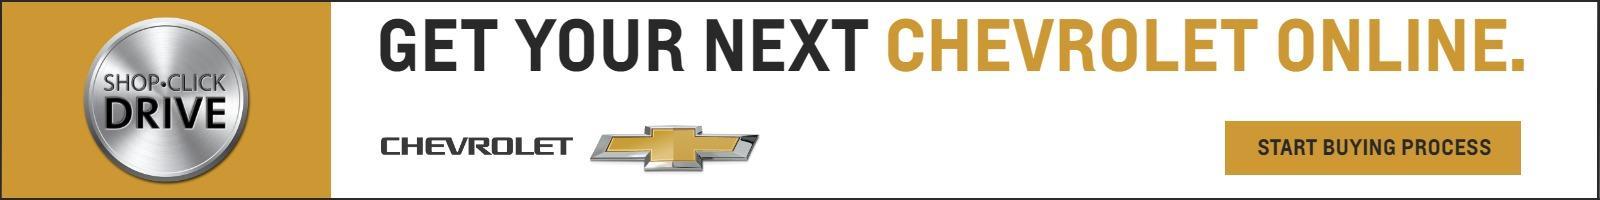 Get your next Chevrolet Online.